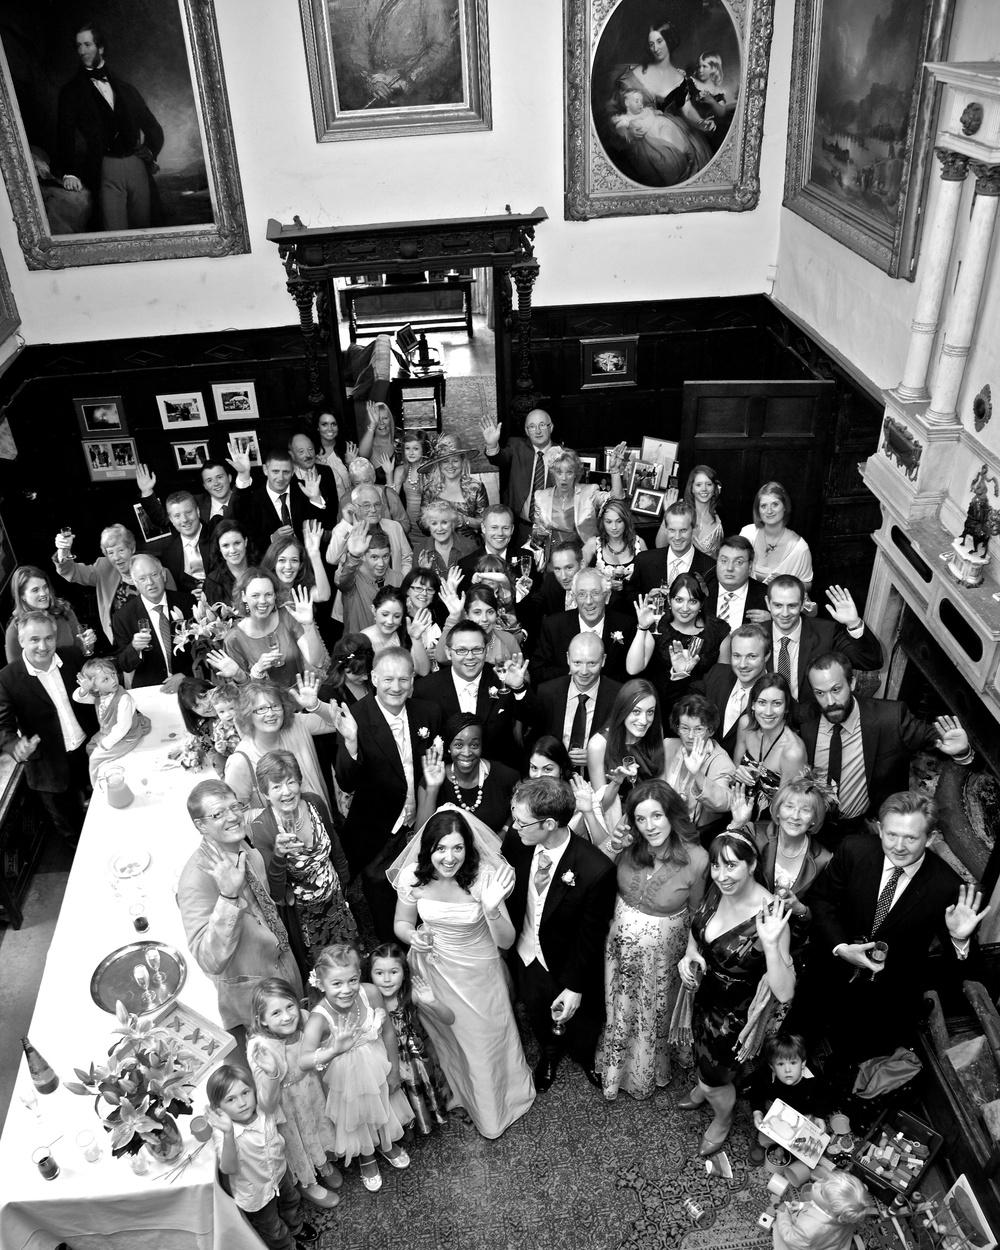 chavenage house wedding photographers preferred supplier  0042.jpg